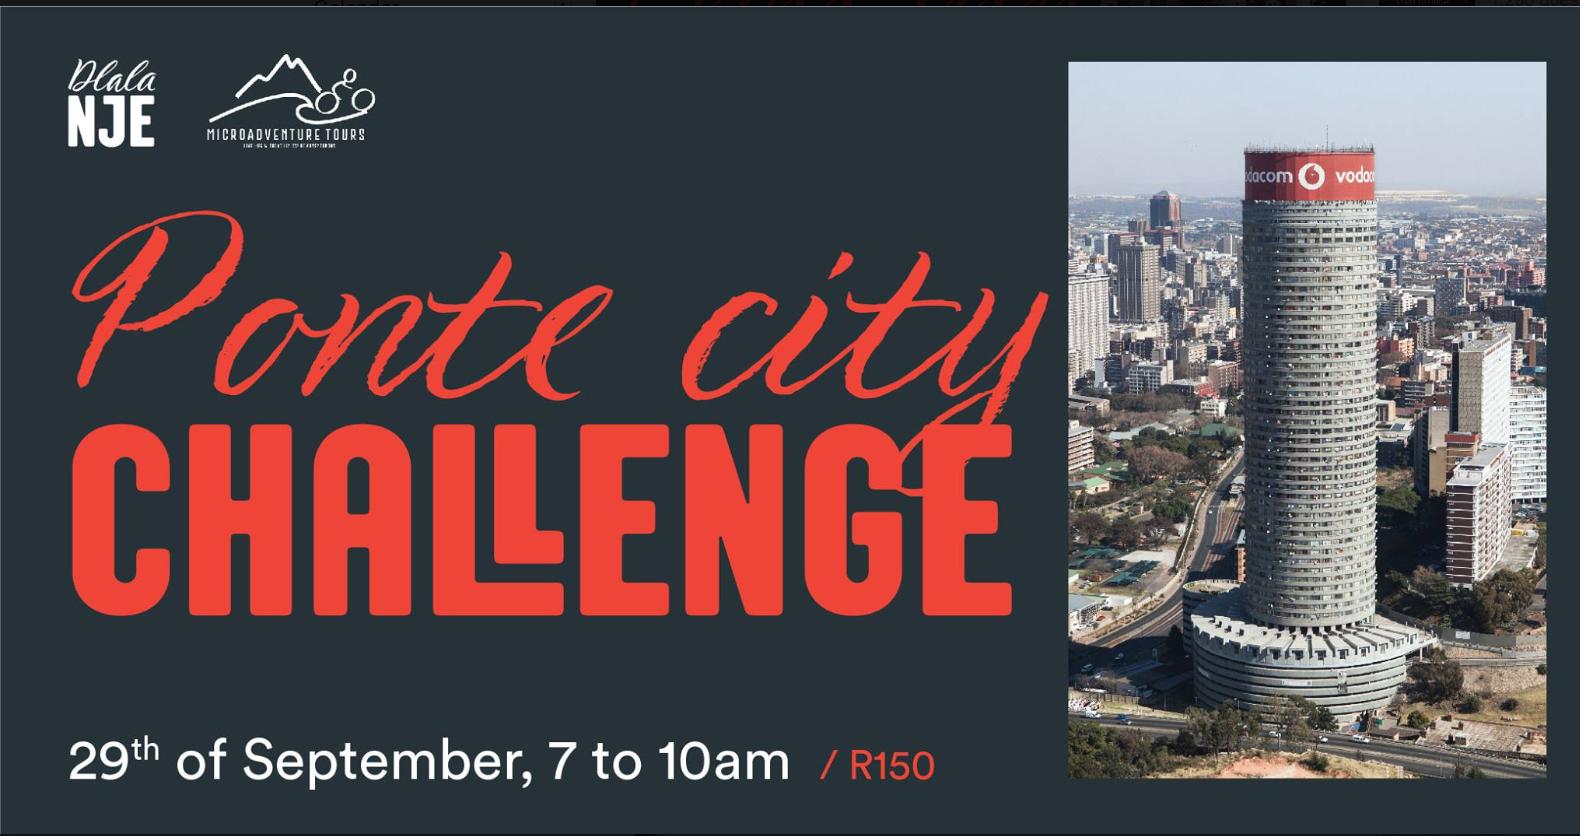 ponte city challenge dlala nje microadventures johannesburg hillbrow south africa (2)